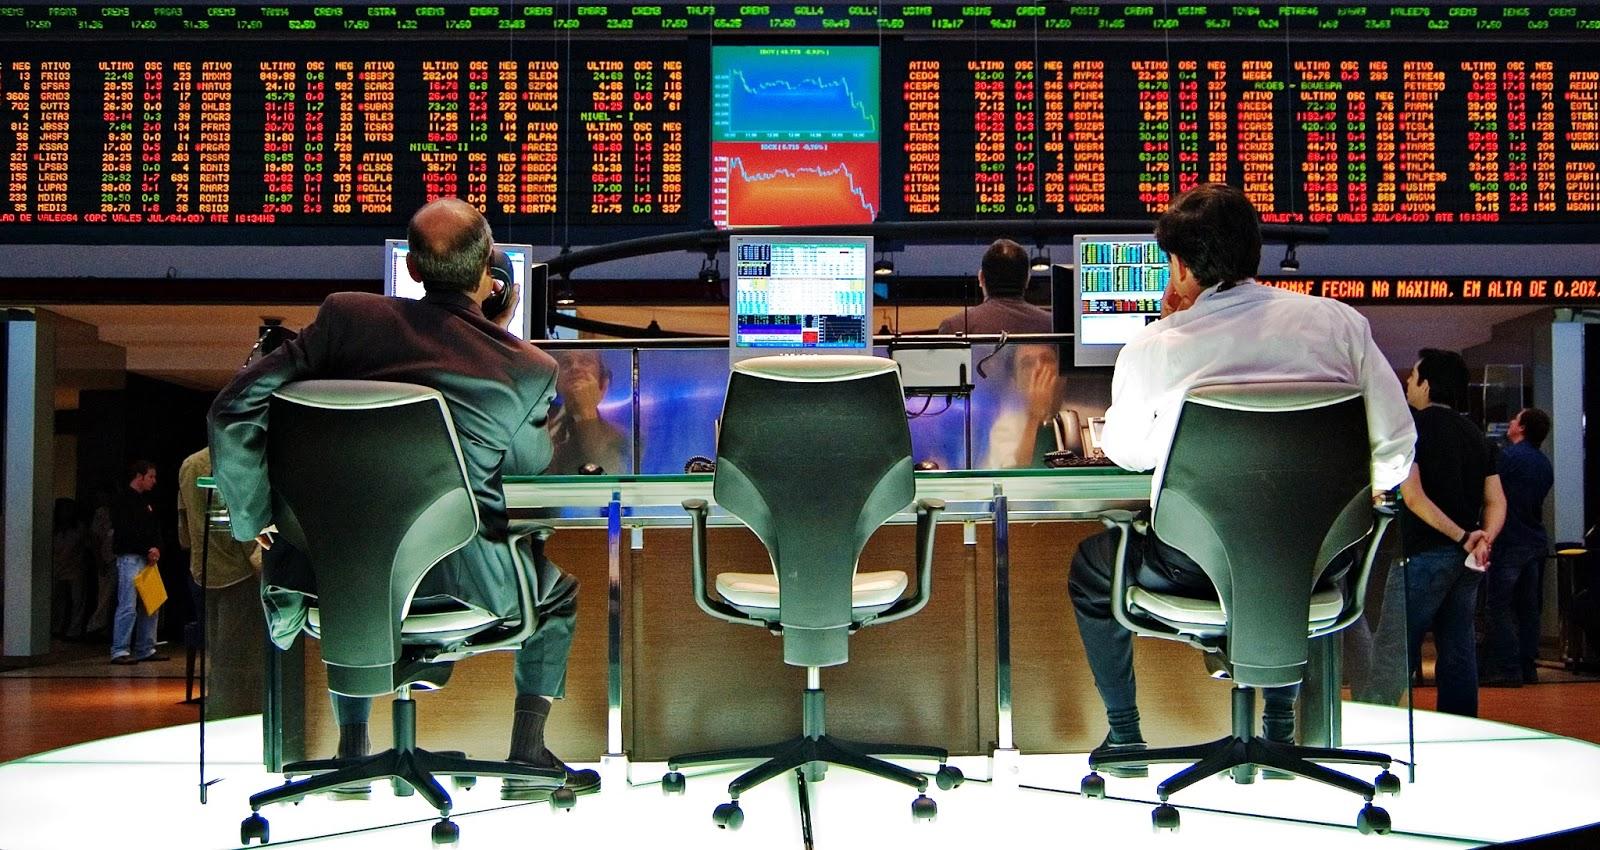 Binary options trading platform tips